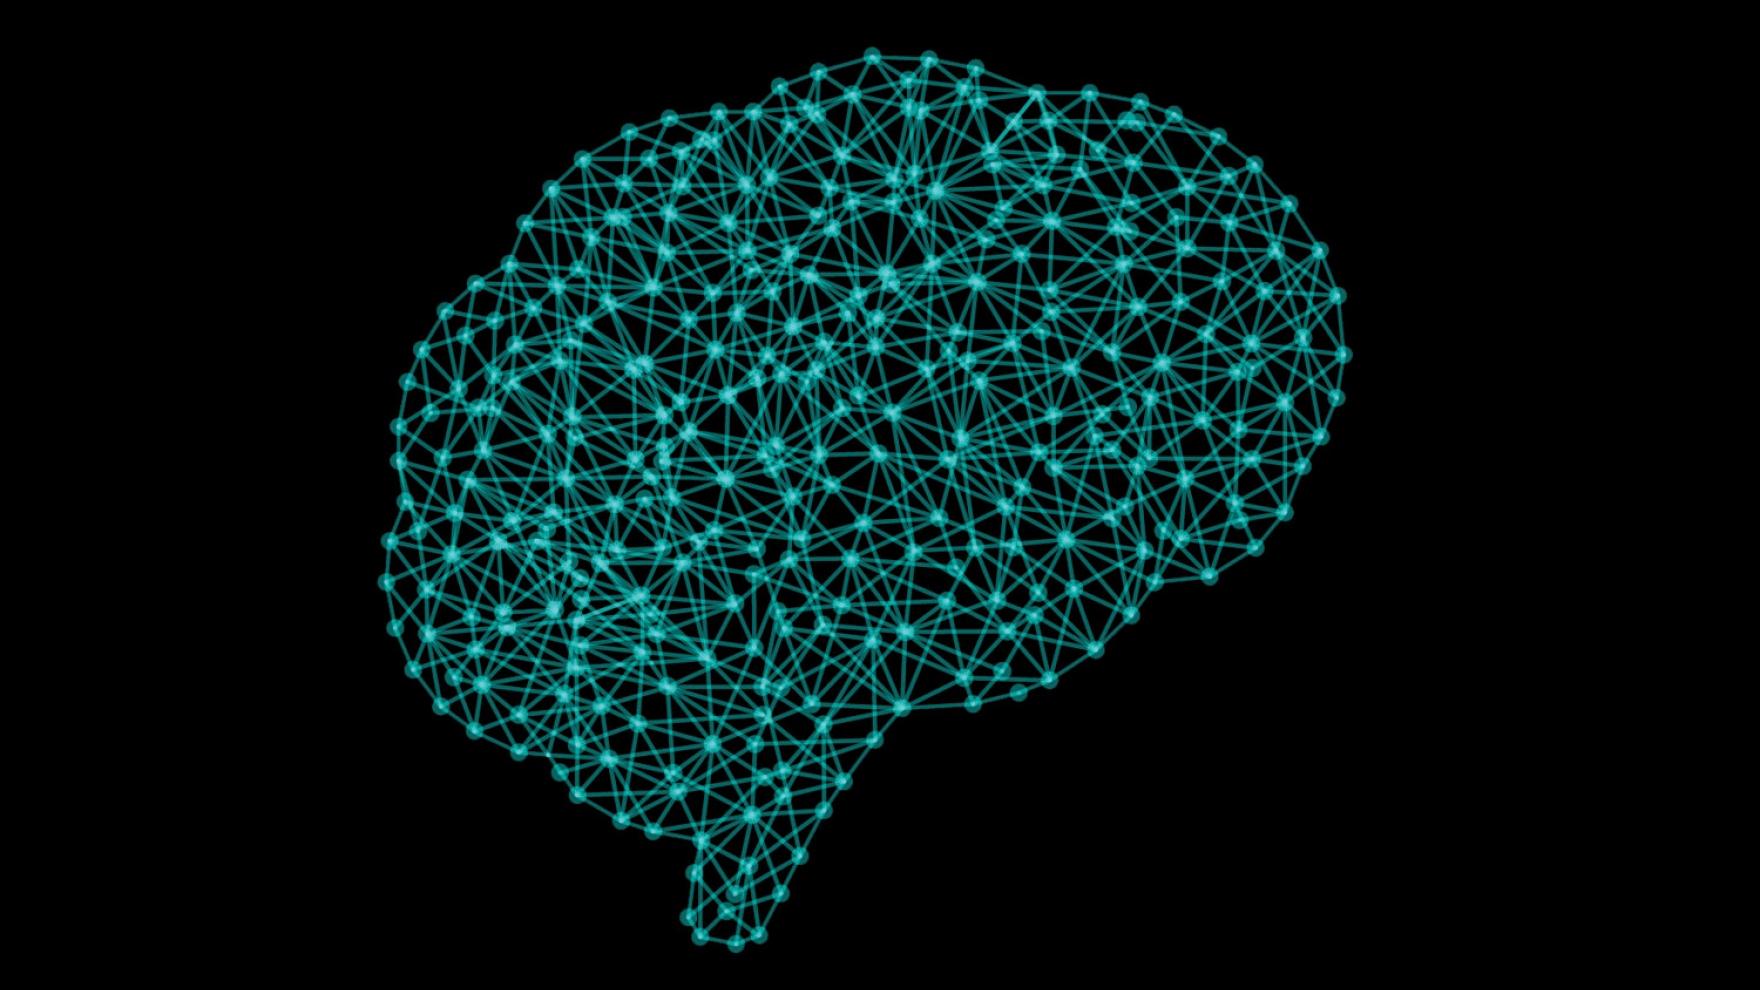 brain image network